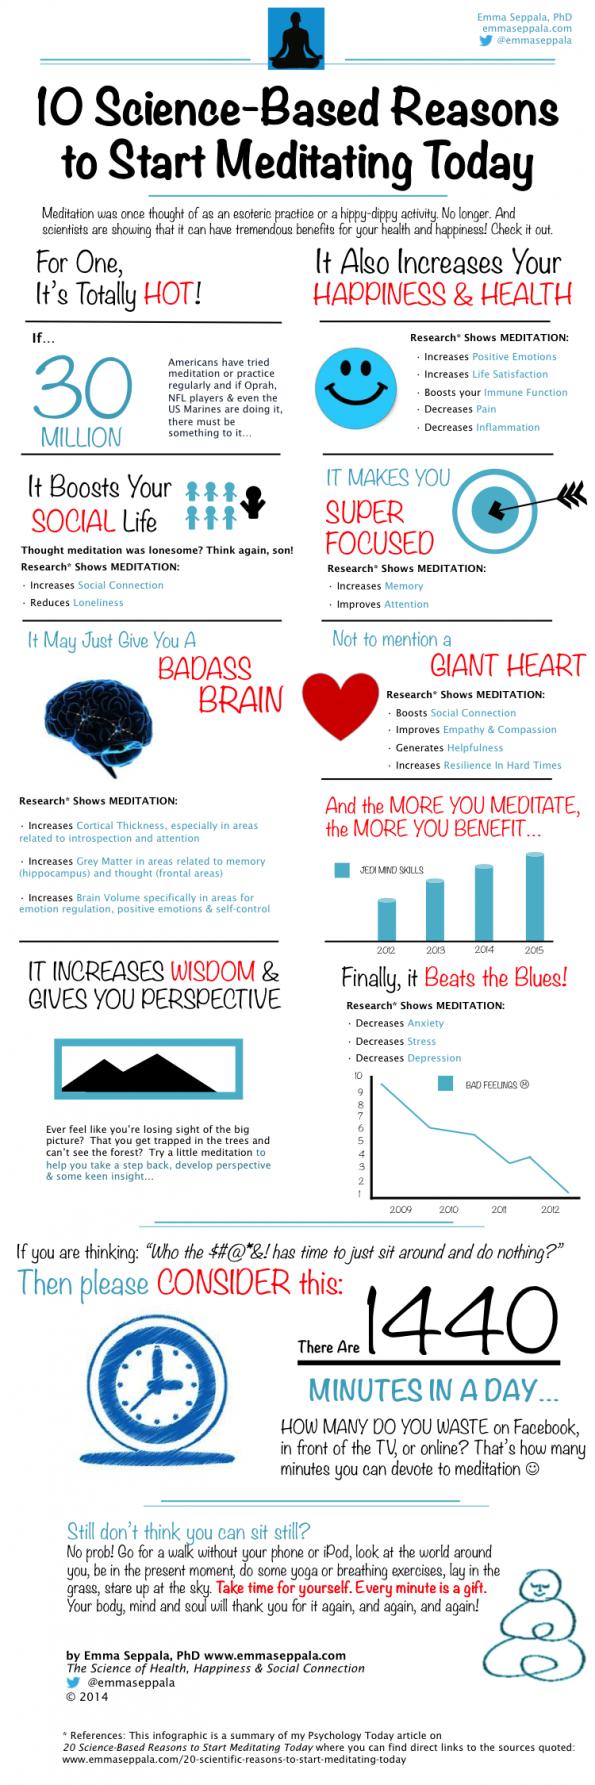 meditation infographic from https://emmaseppala.com/10-science-based-reasons-start-meditating-today-infographic/#.WjzOfVSFhrw